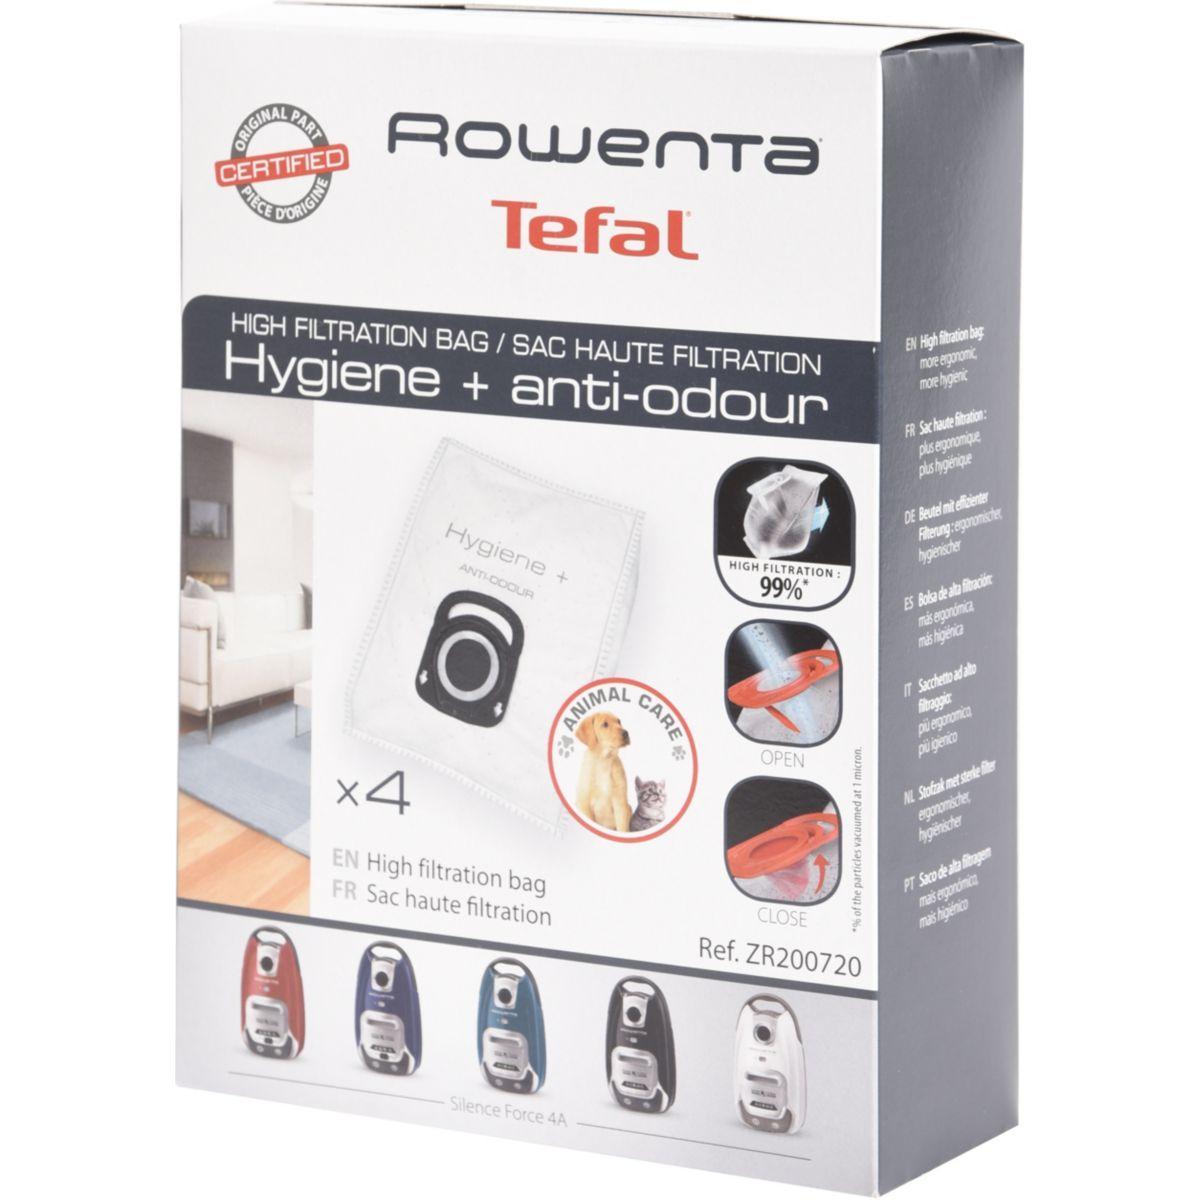 Sac aspirateur rowenta 4 sacs haute filt. hygi�ne+ anti odeur